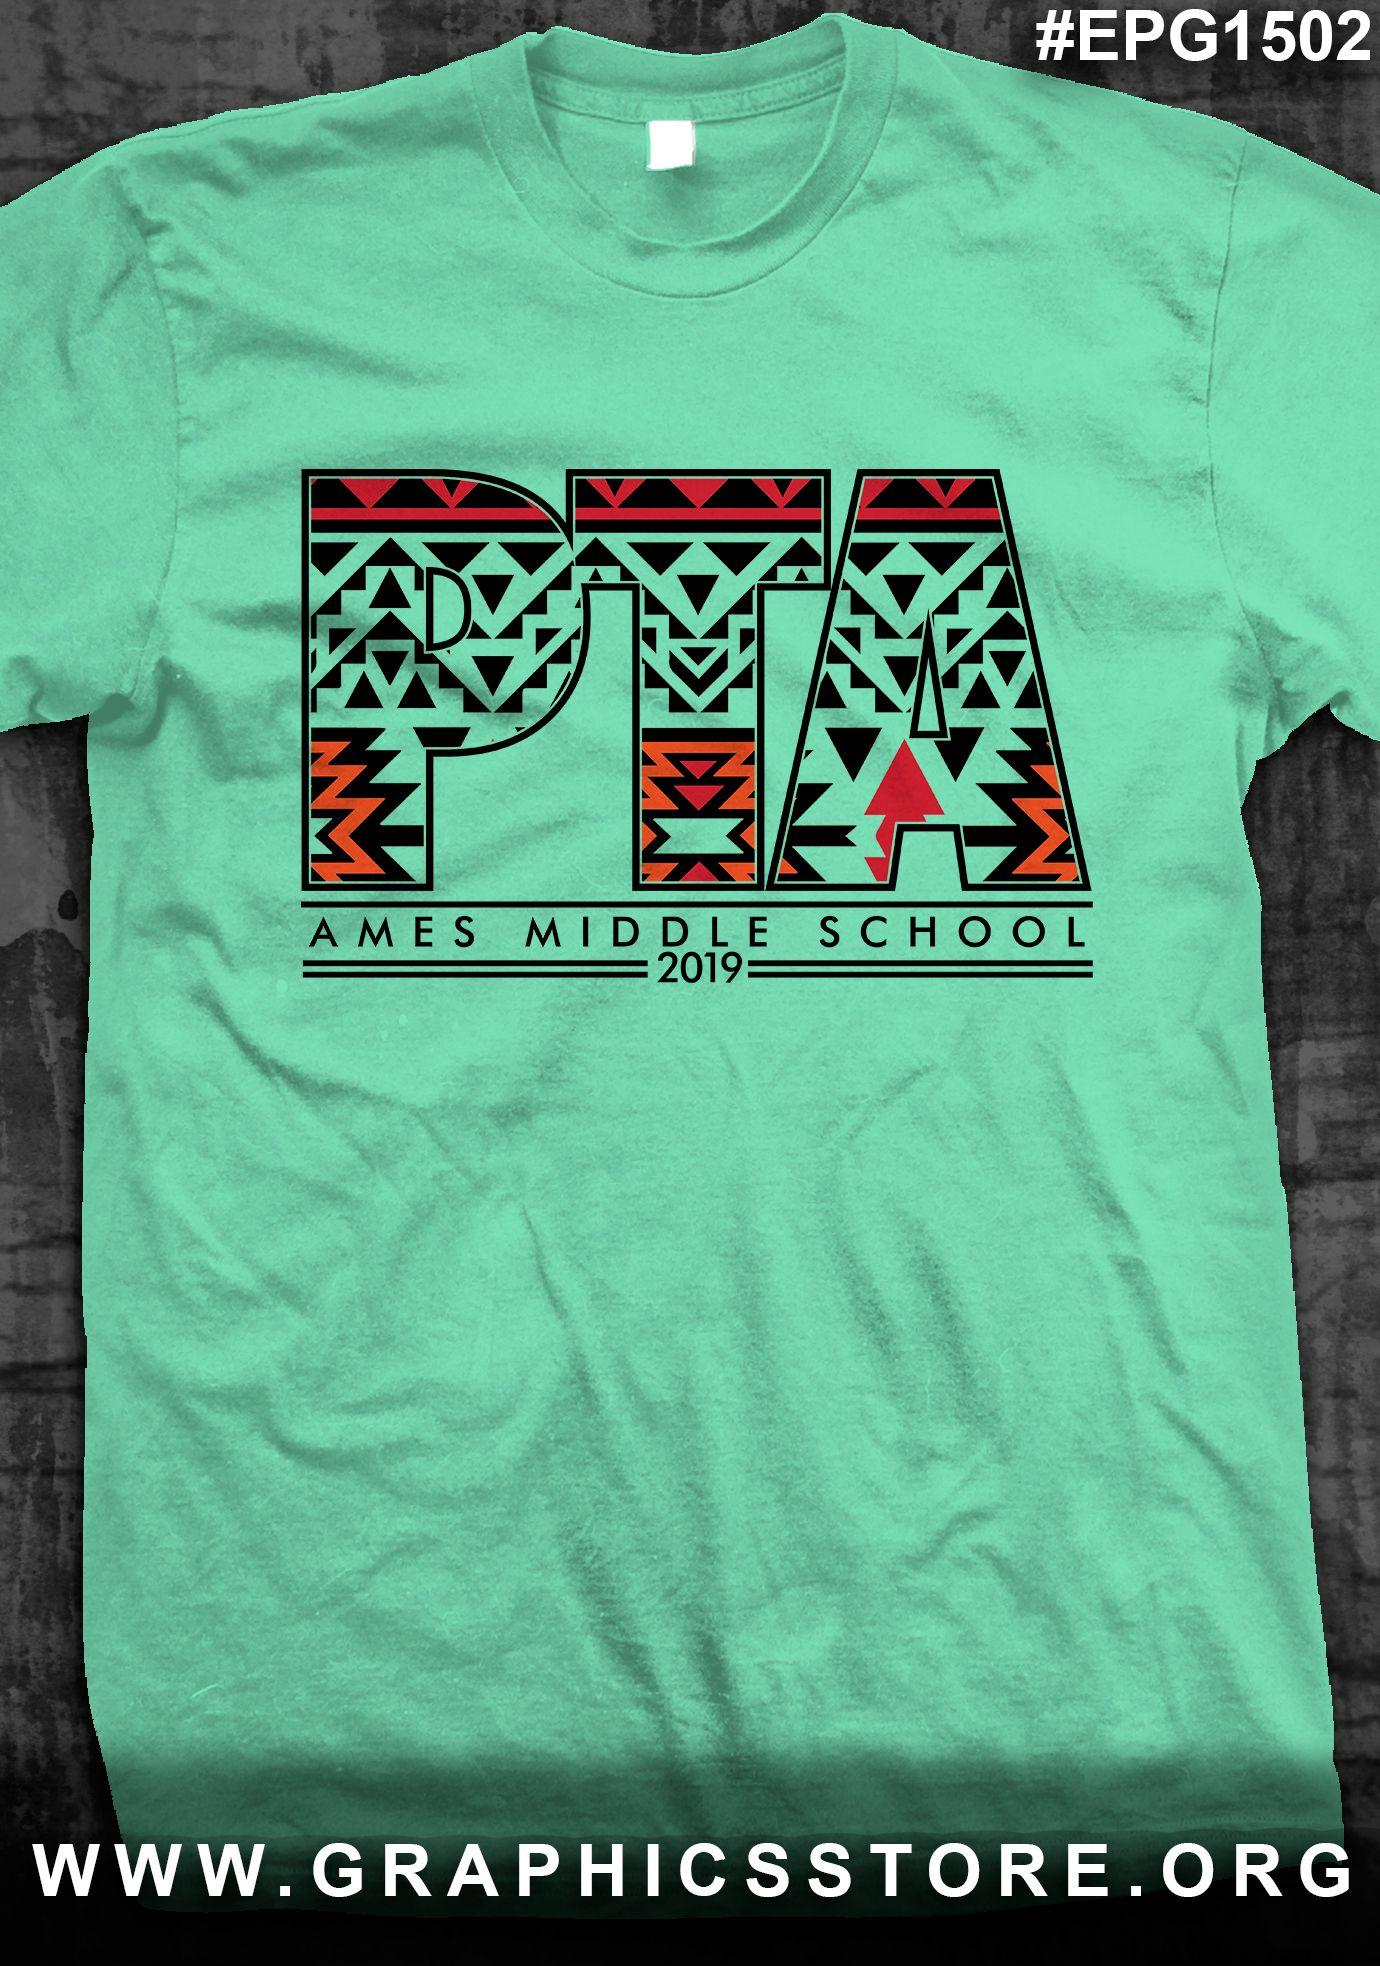 Shirt design green - Epg1502 Pta School Shirt